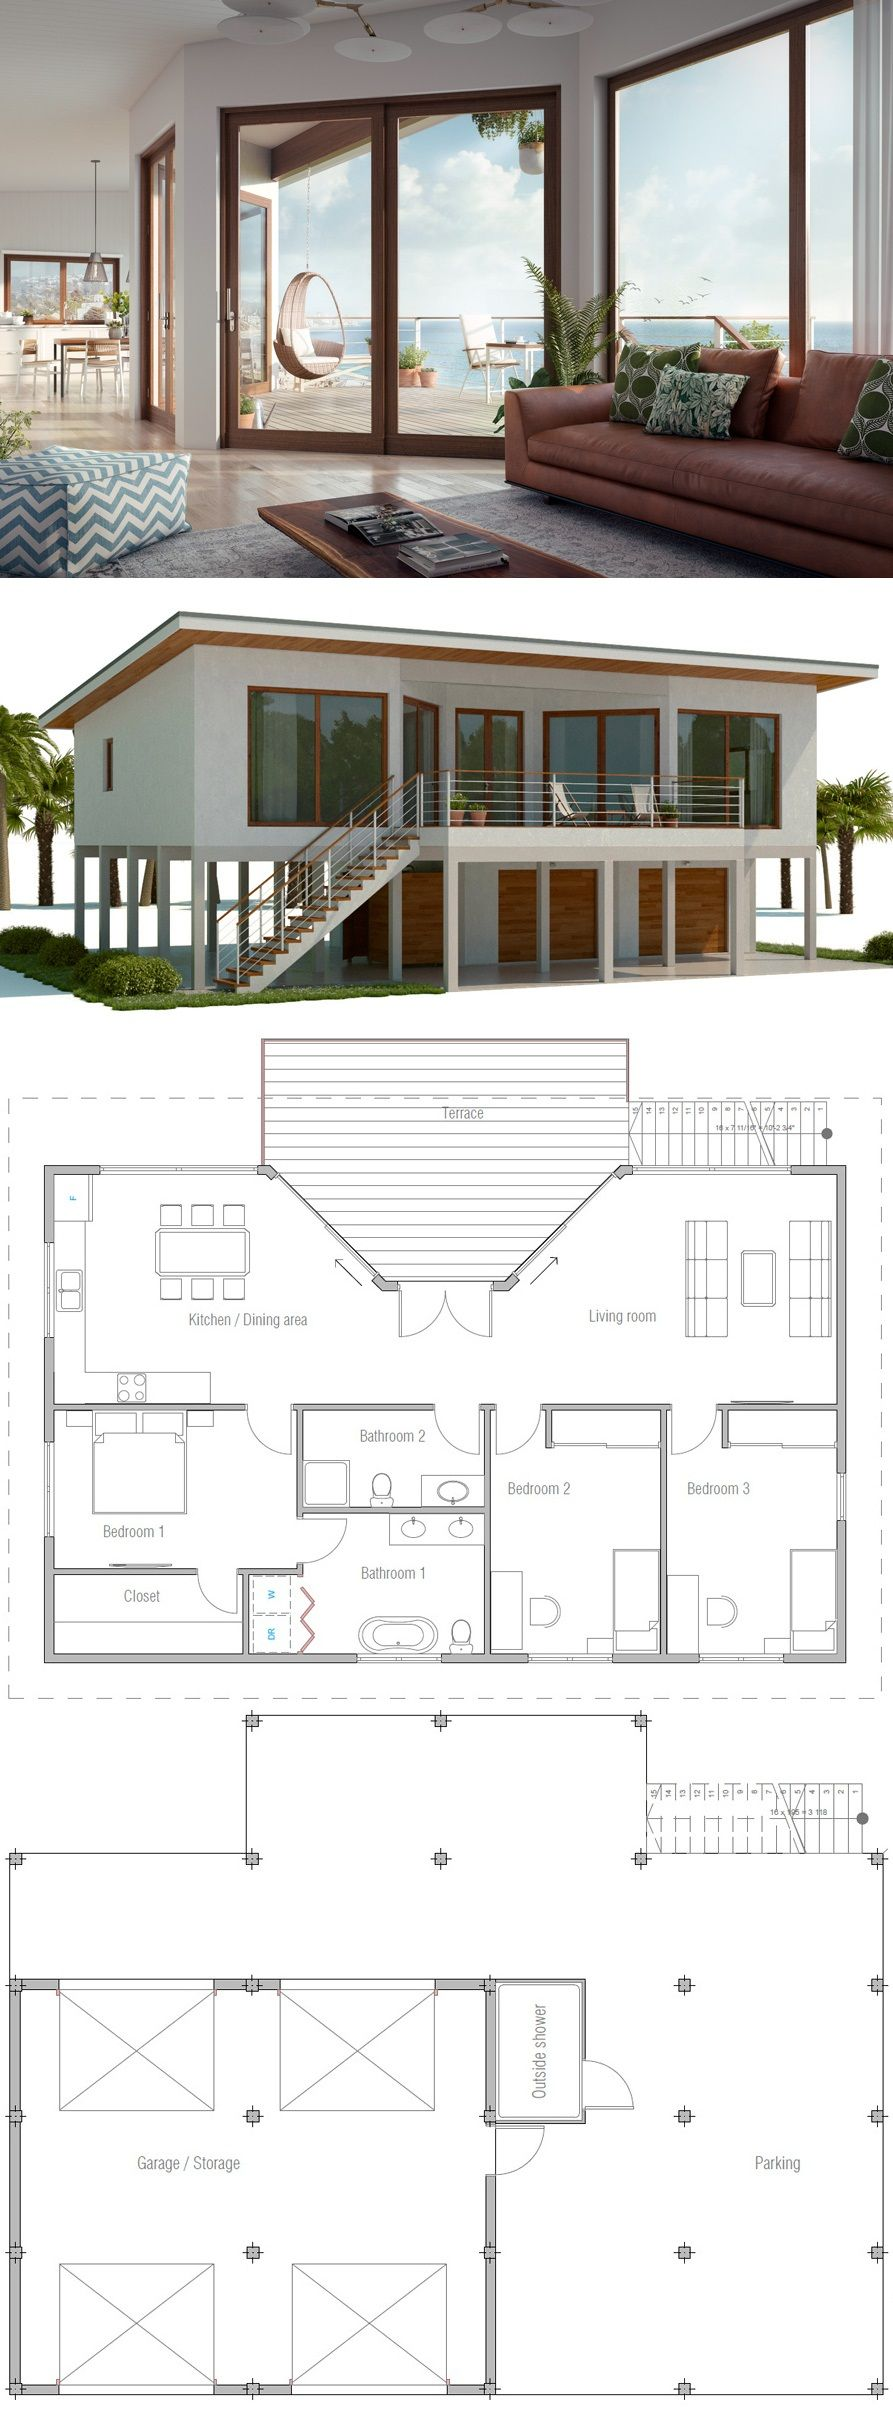 Raised Coastal House Plan Beach House Plan House On Piers Beach House Floor Plans Coastal House Plans Beach House Design